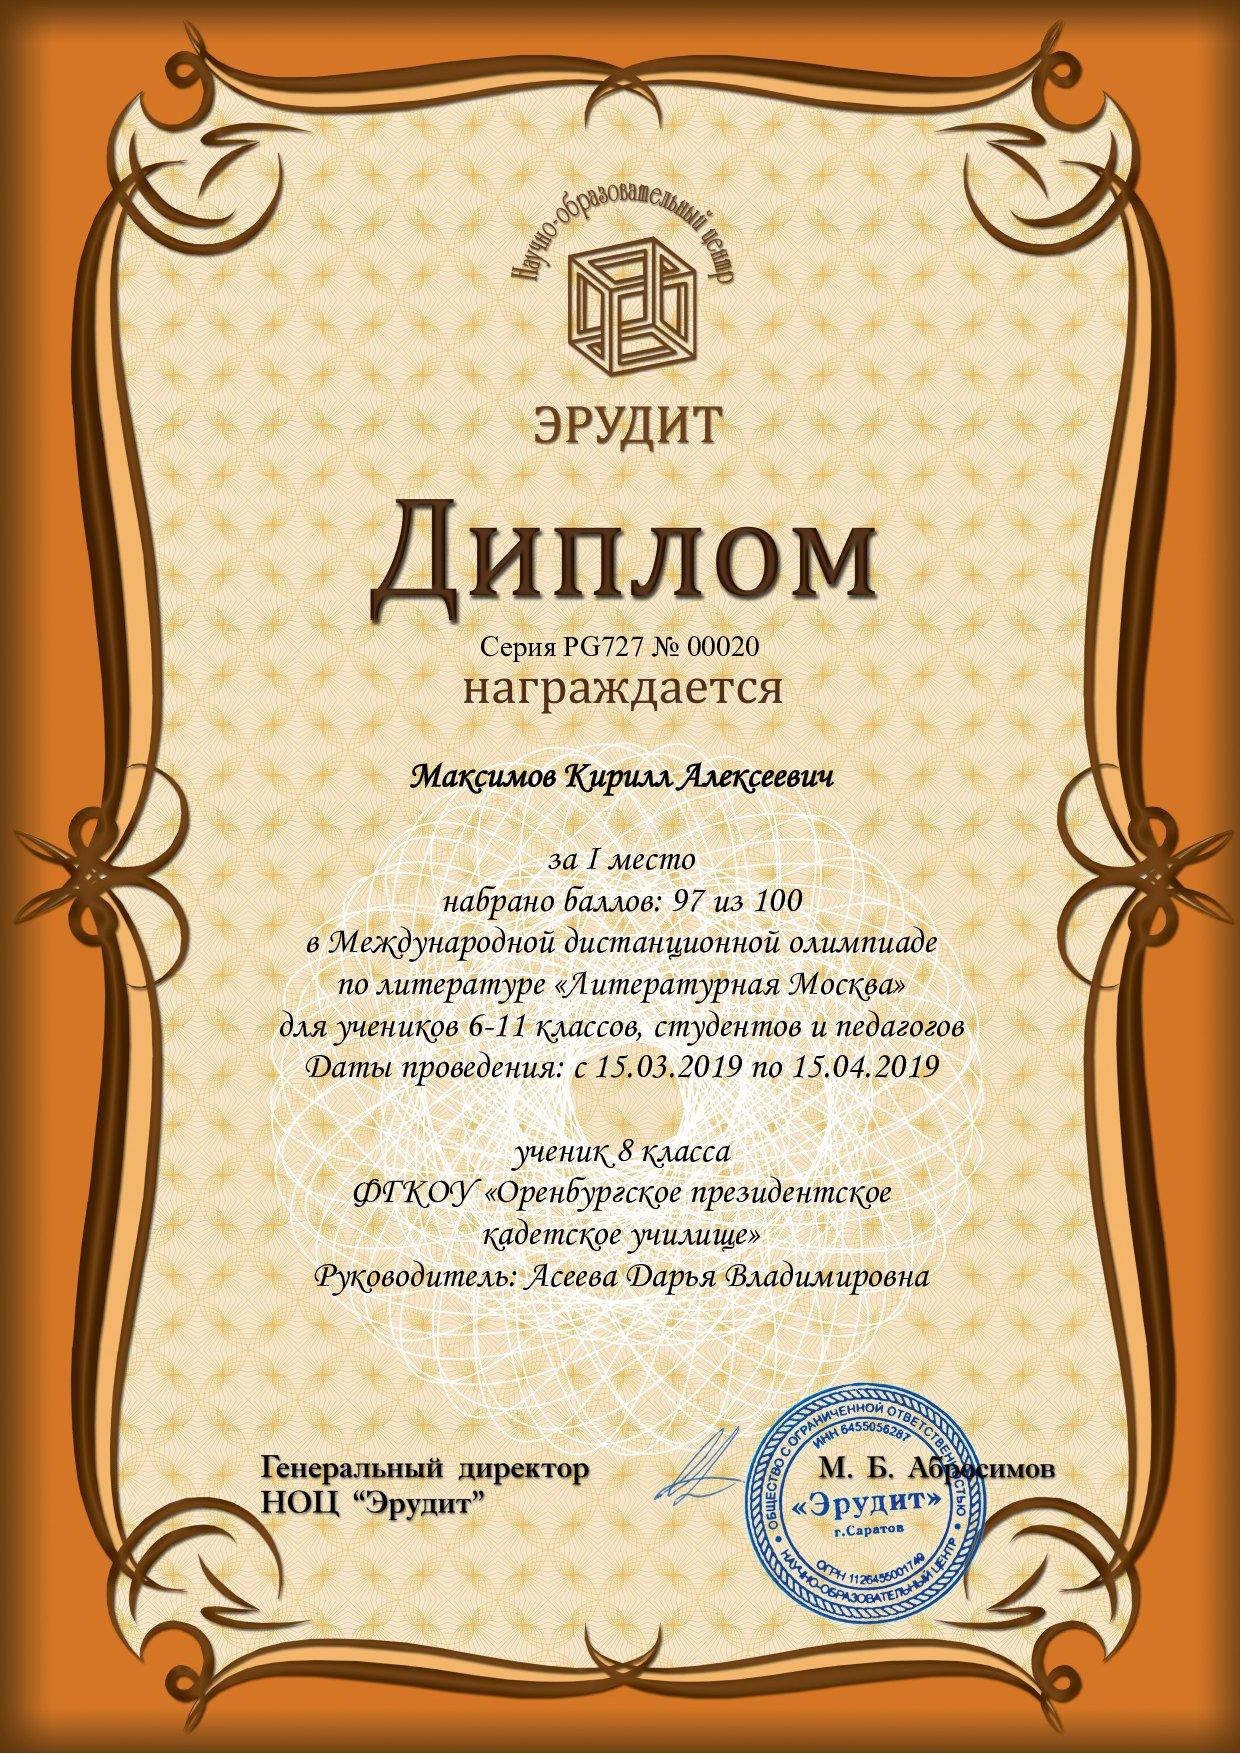 s 1 Максимов Кирилл Алексеевич G727